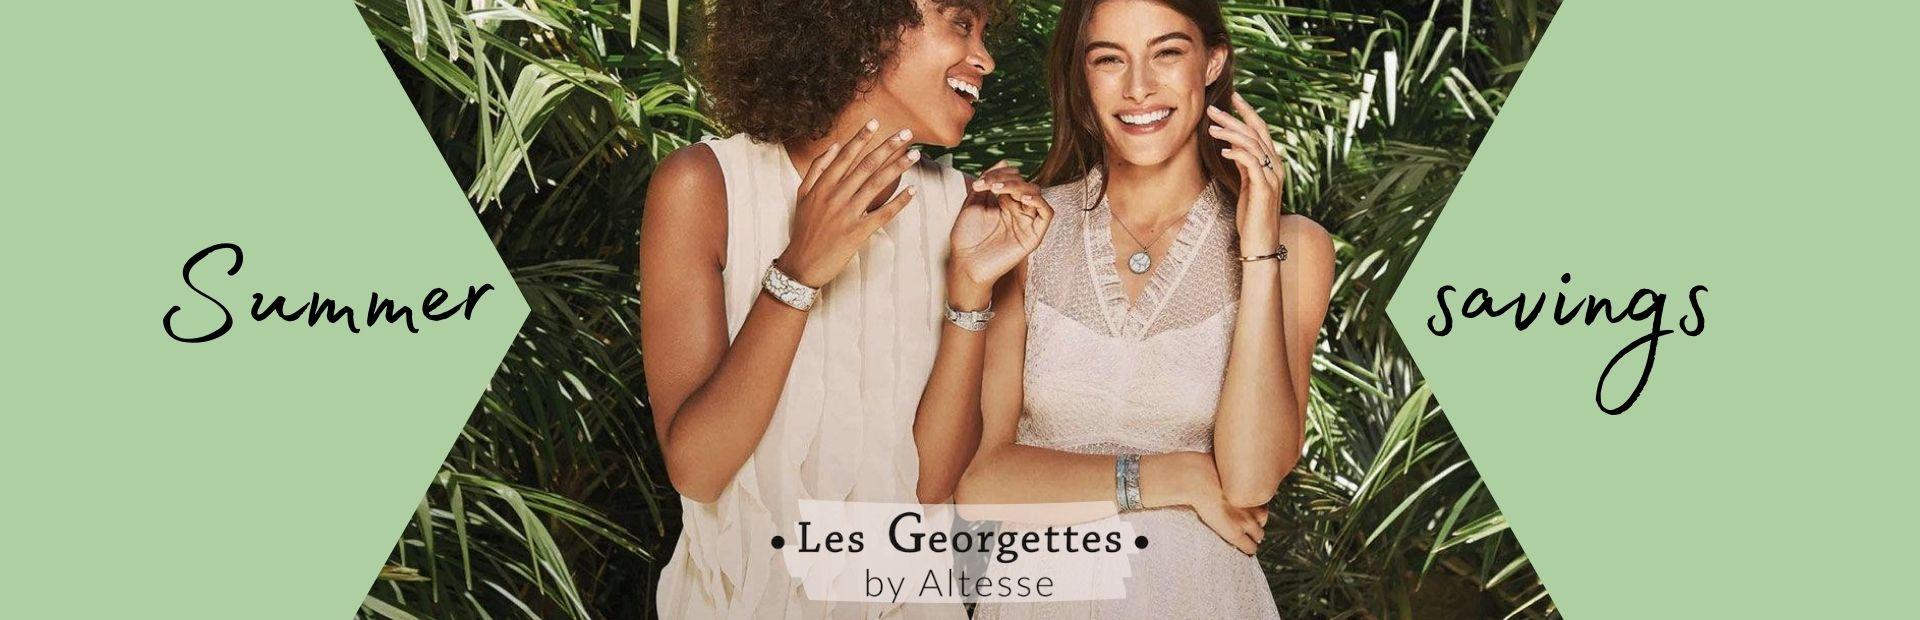 Les Georgettes Summer Sale